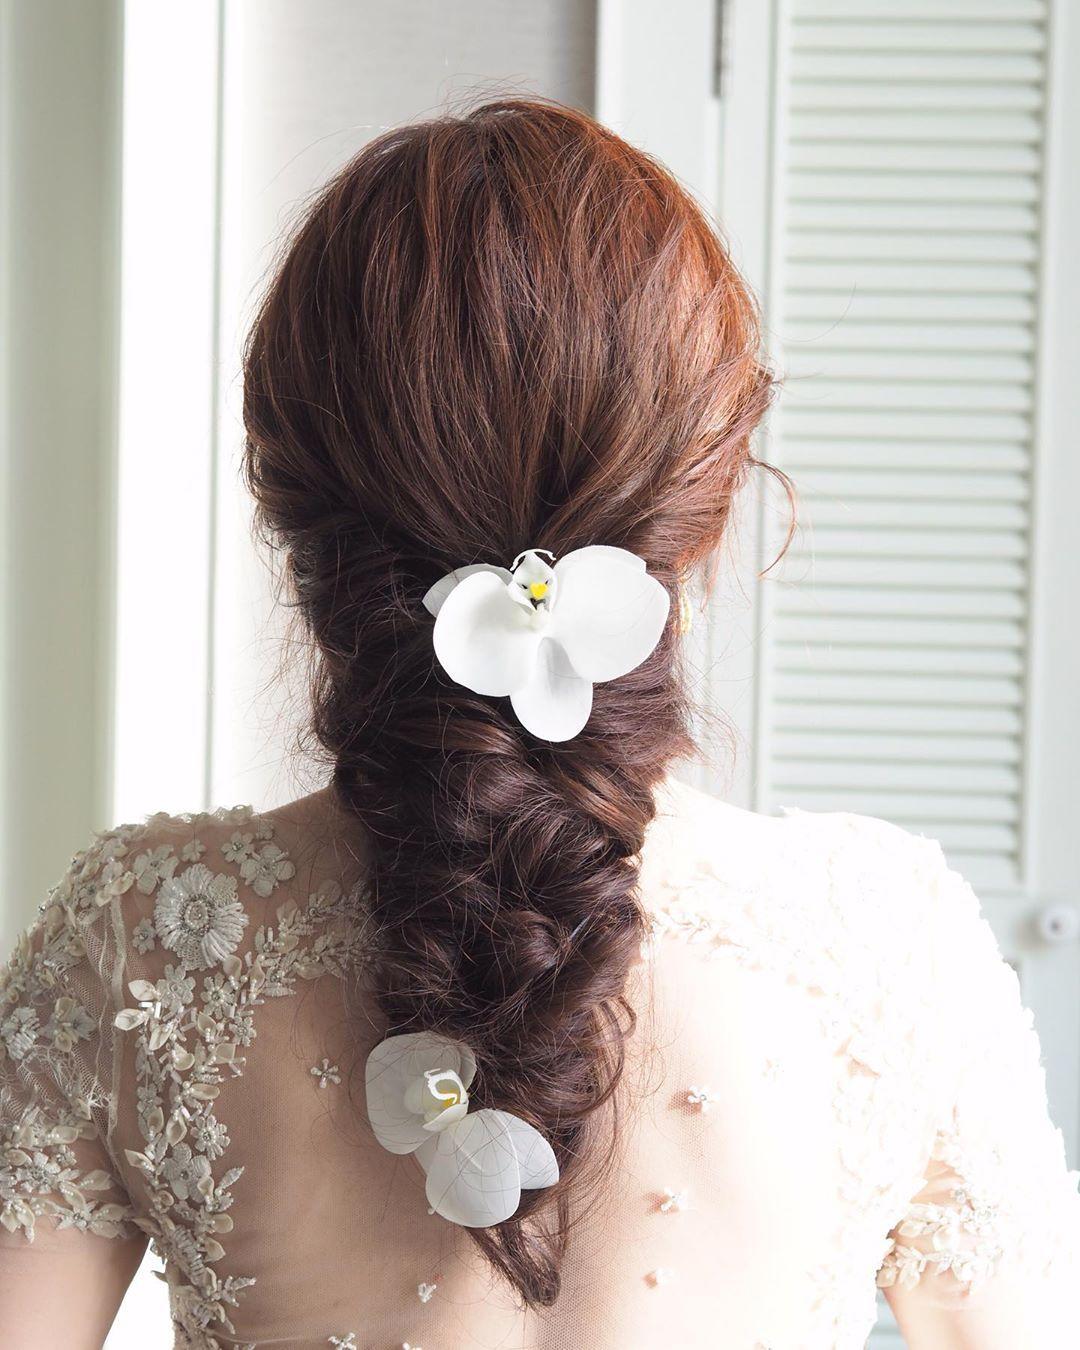 Hair by me @showryu for bride 👰🏻❤️ #minimal #classic #hairstyle #hair #hairs #updo #hairdo #instahair #hairpost #wedding #weddinghair #bride #happy  #